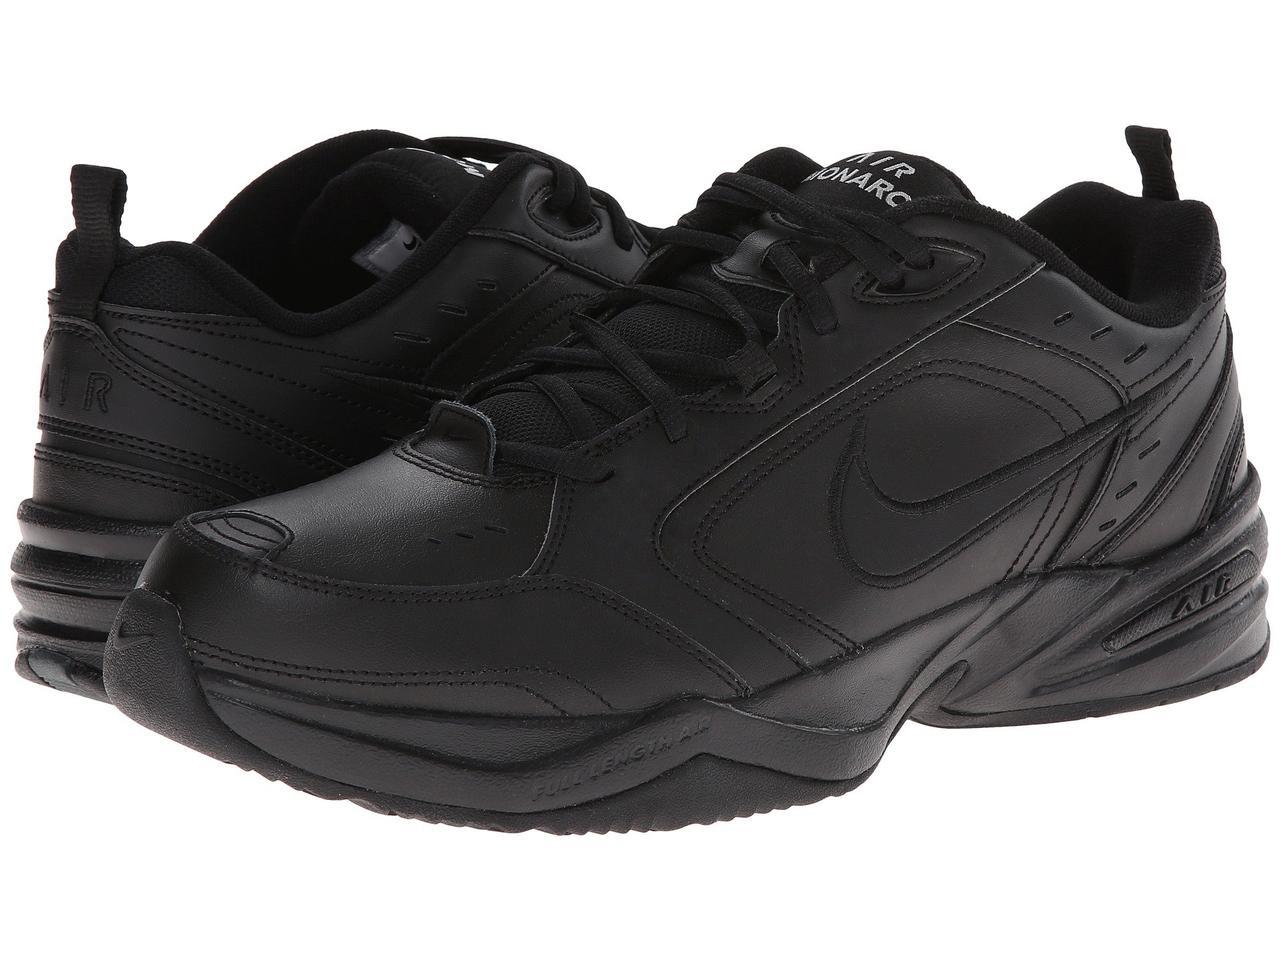 1788dcd727c7 Кроссовки Кеды (Оригинал) Nike Air Monarch IV Black Black, цена 2 ...